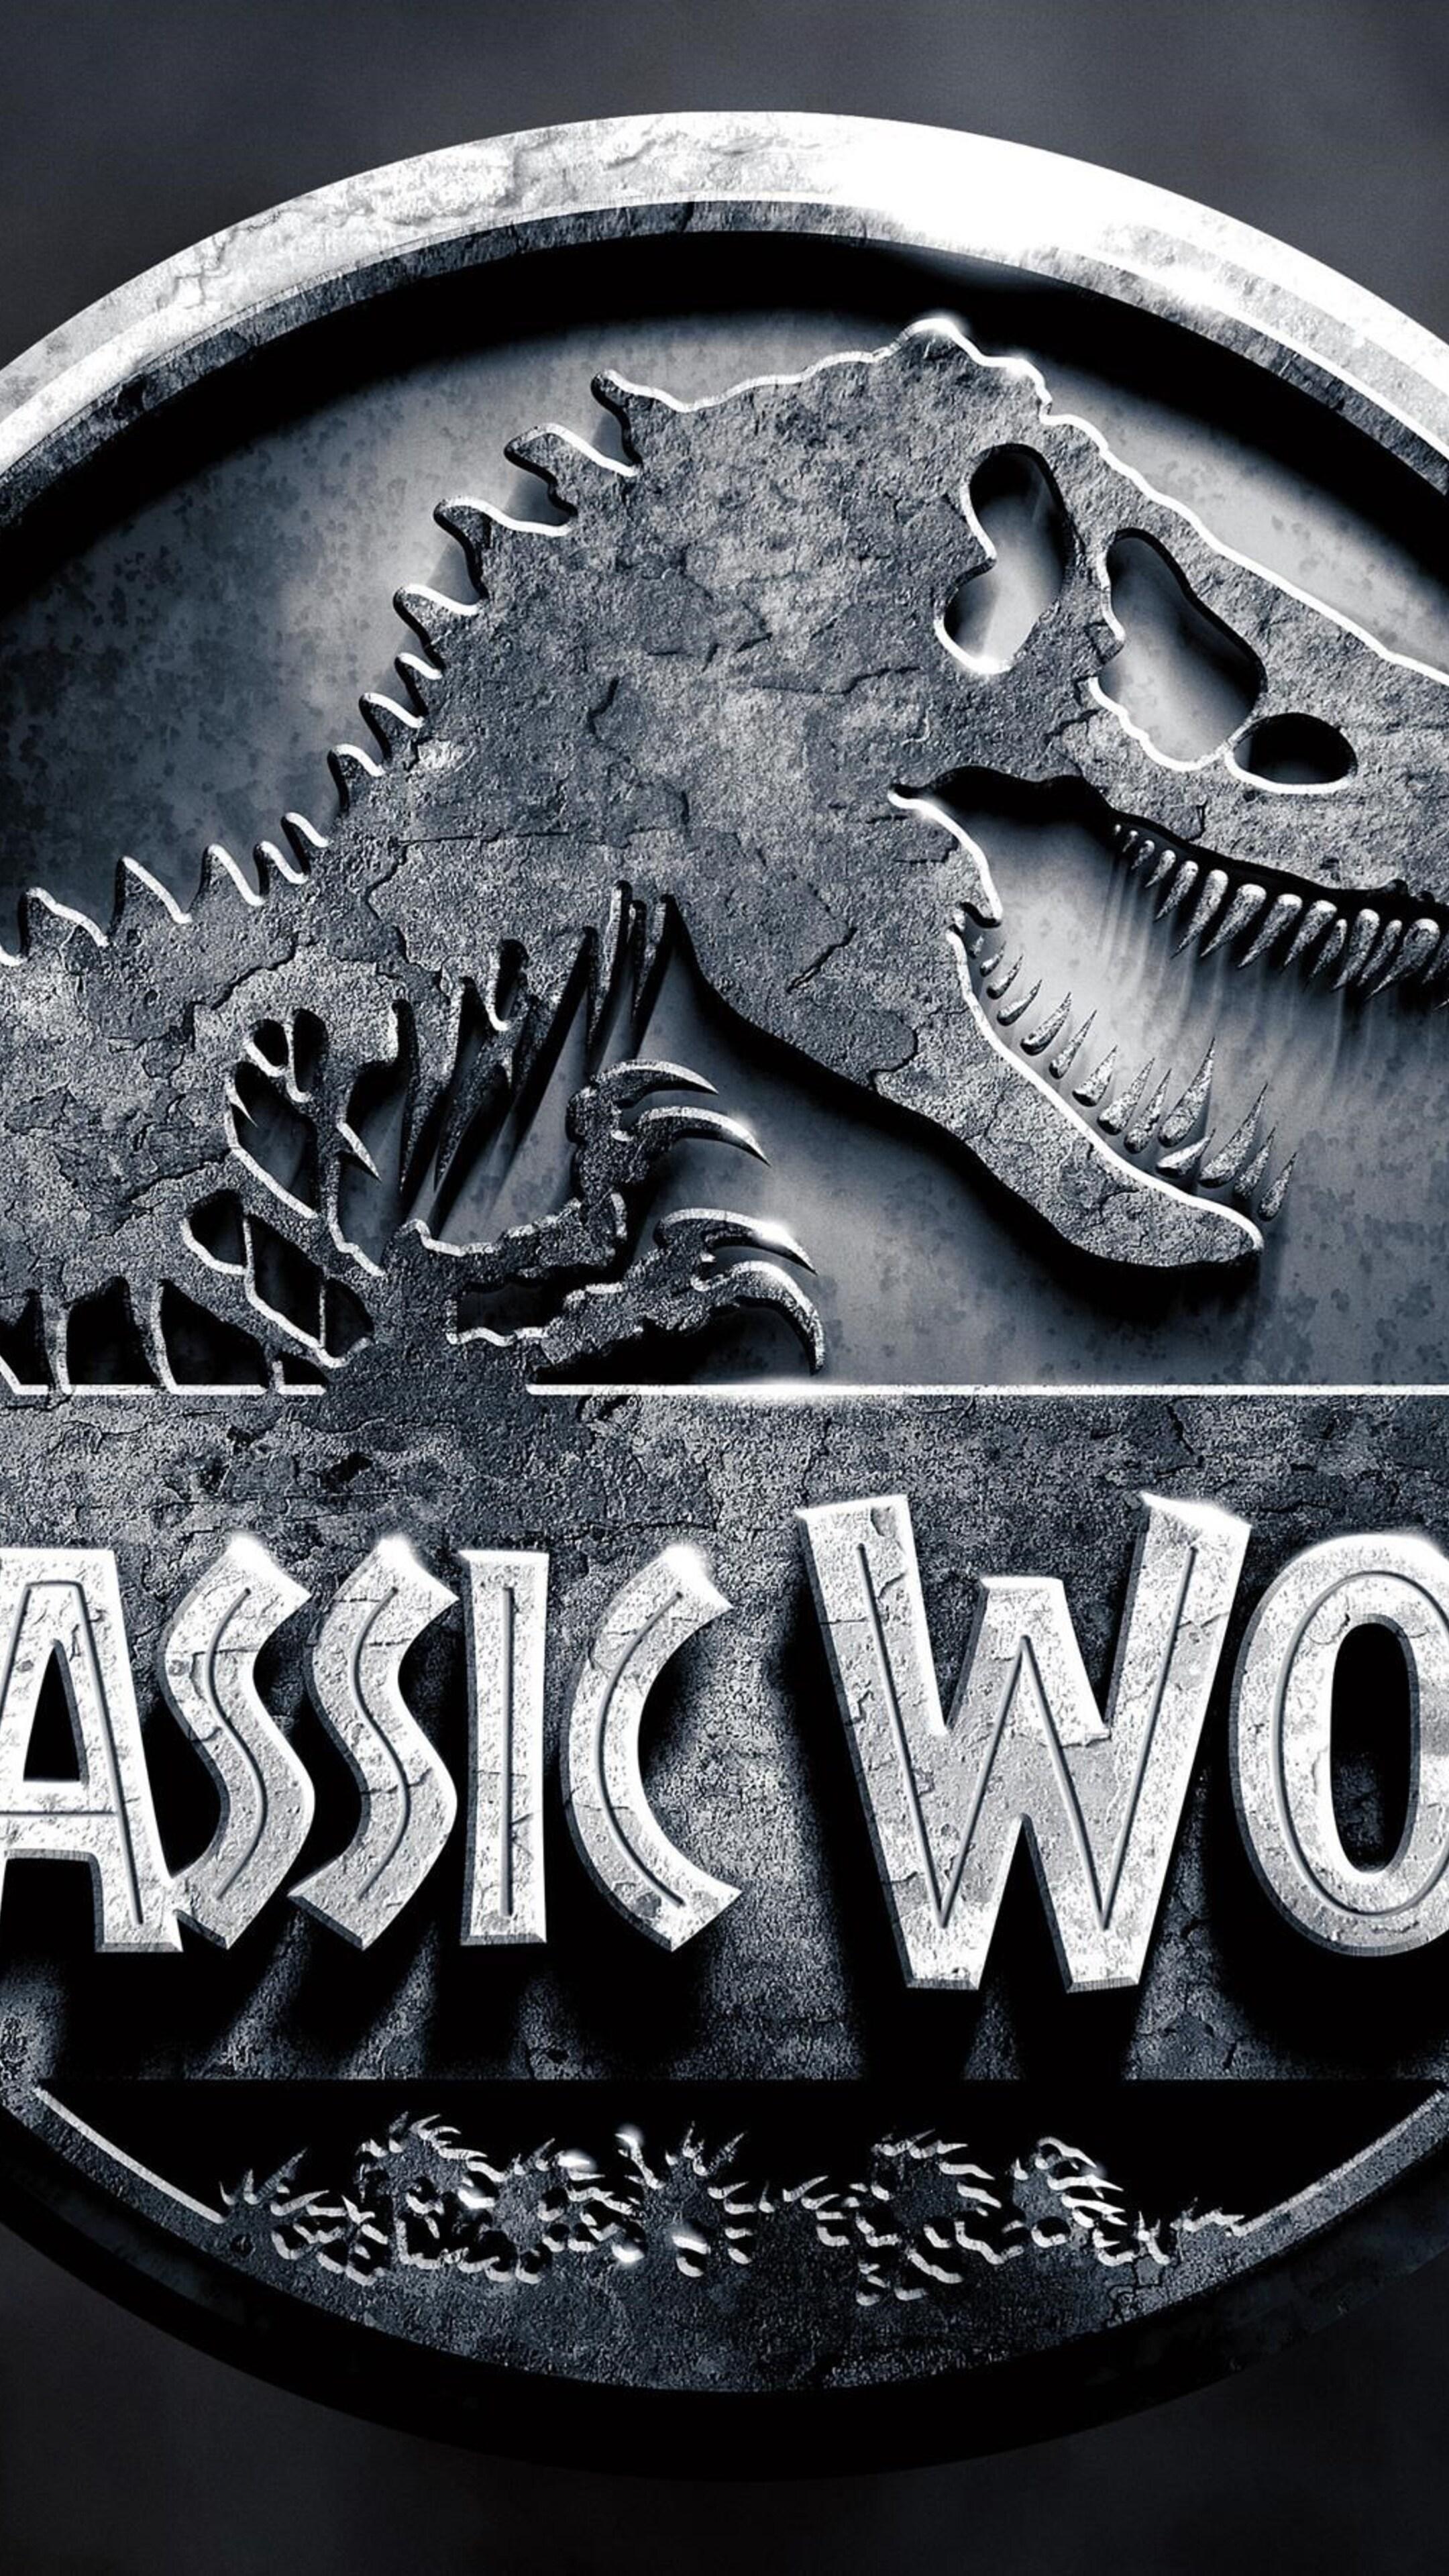 jurassic-world-2015-movie.jpg